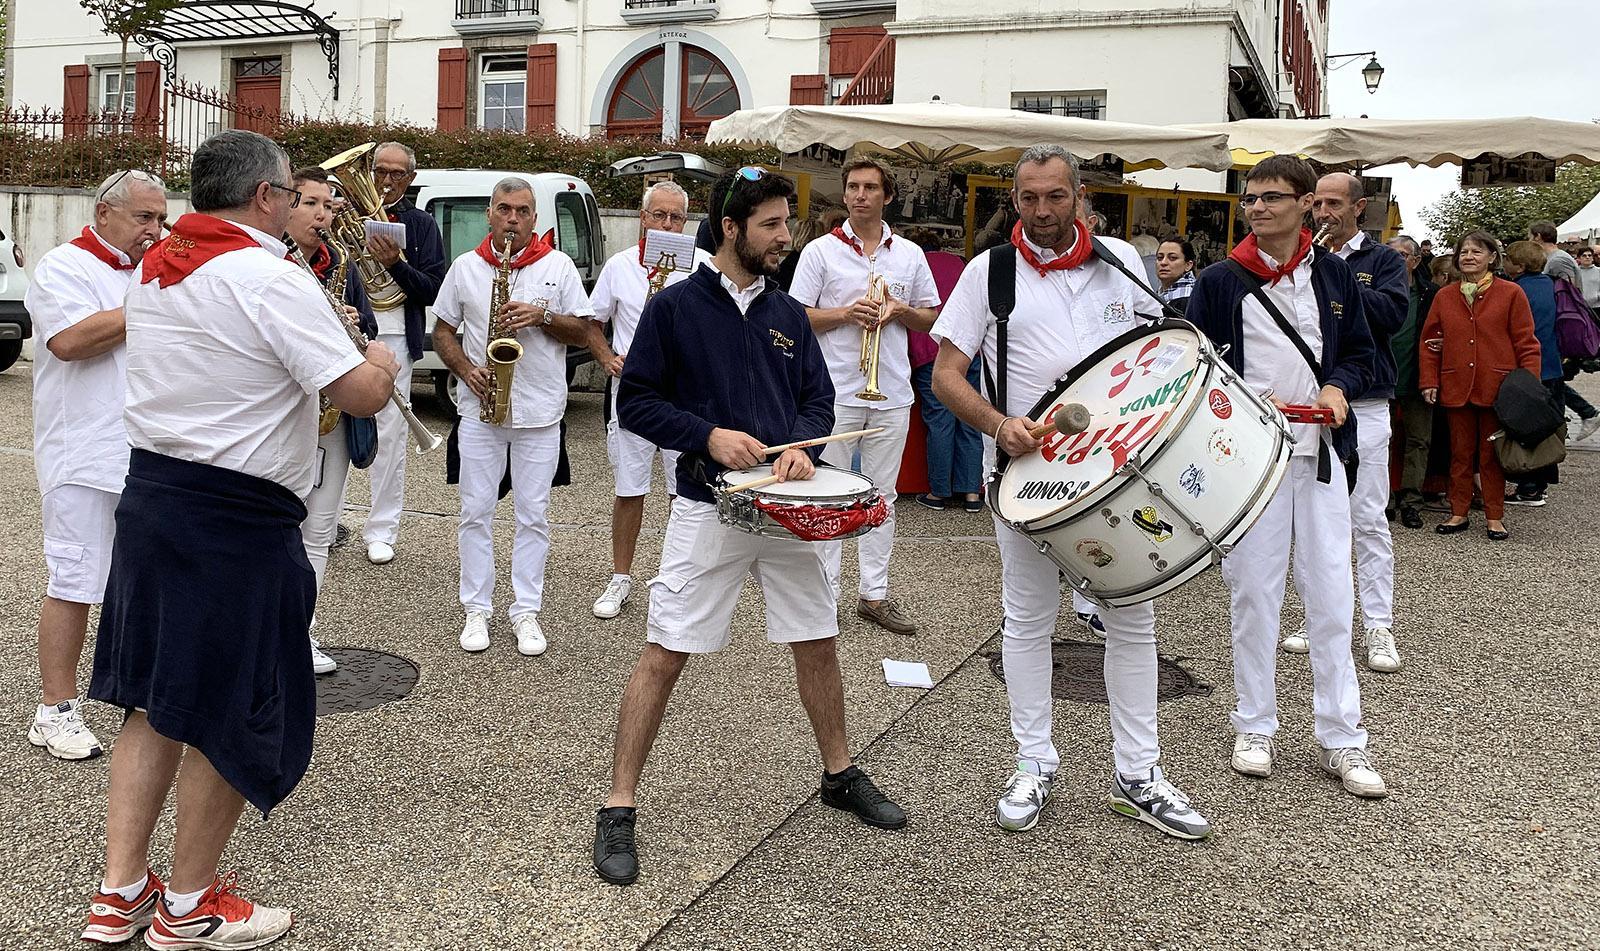 Fête du Gâteau Basque: Musik gehört dazu! Foto: Hilke Maunder